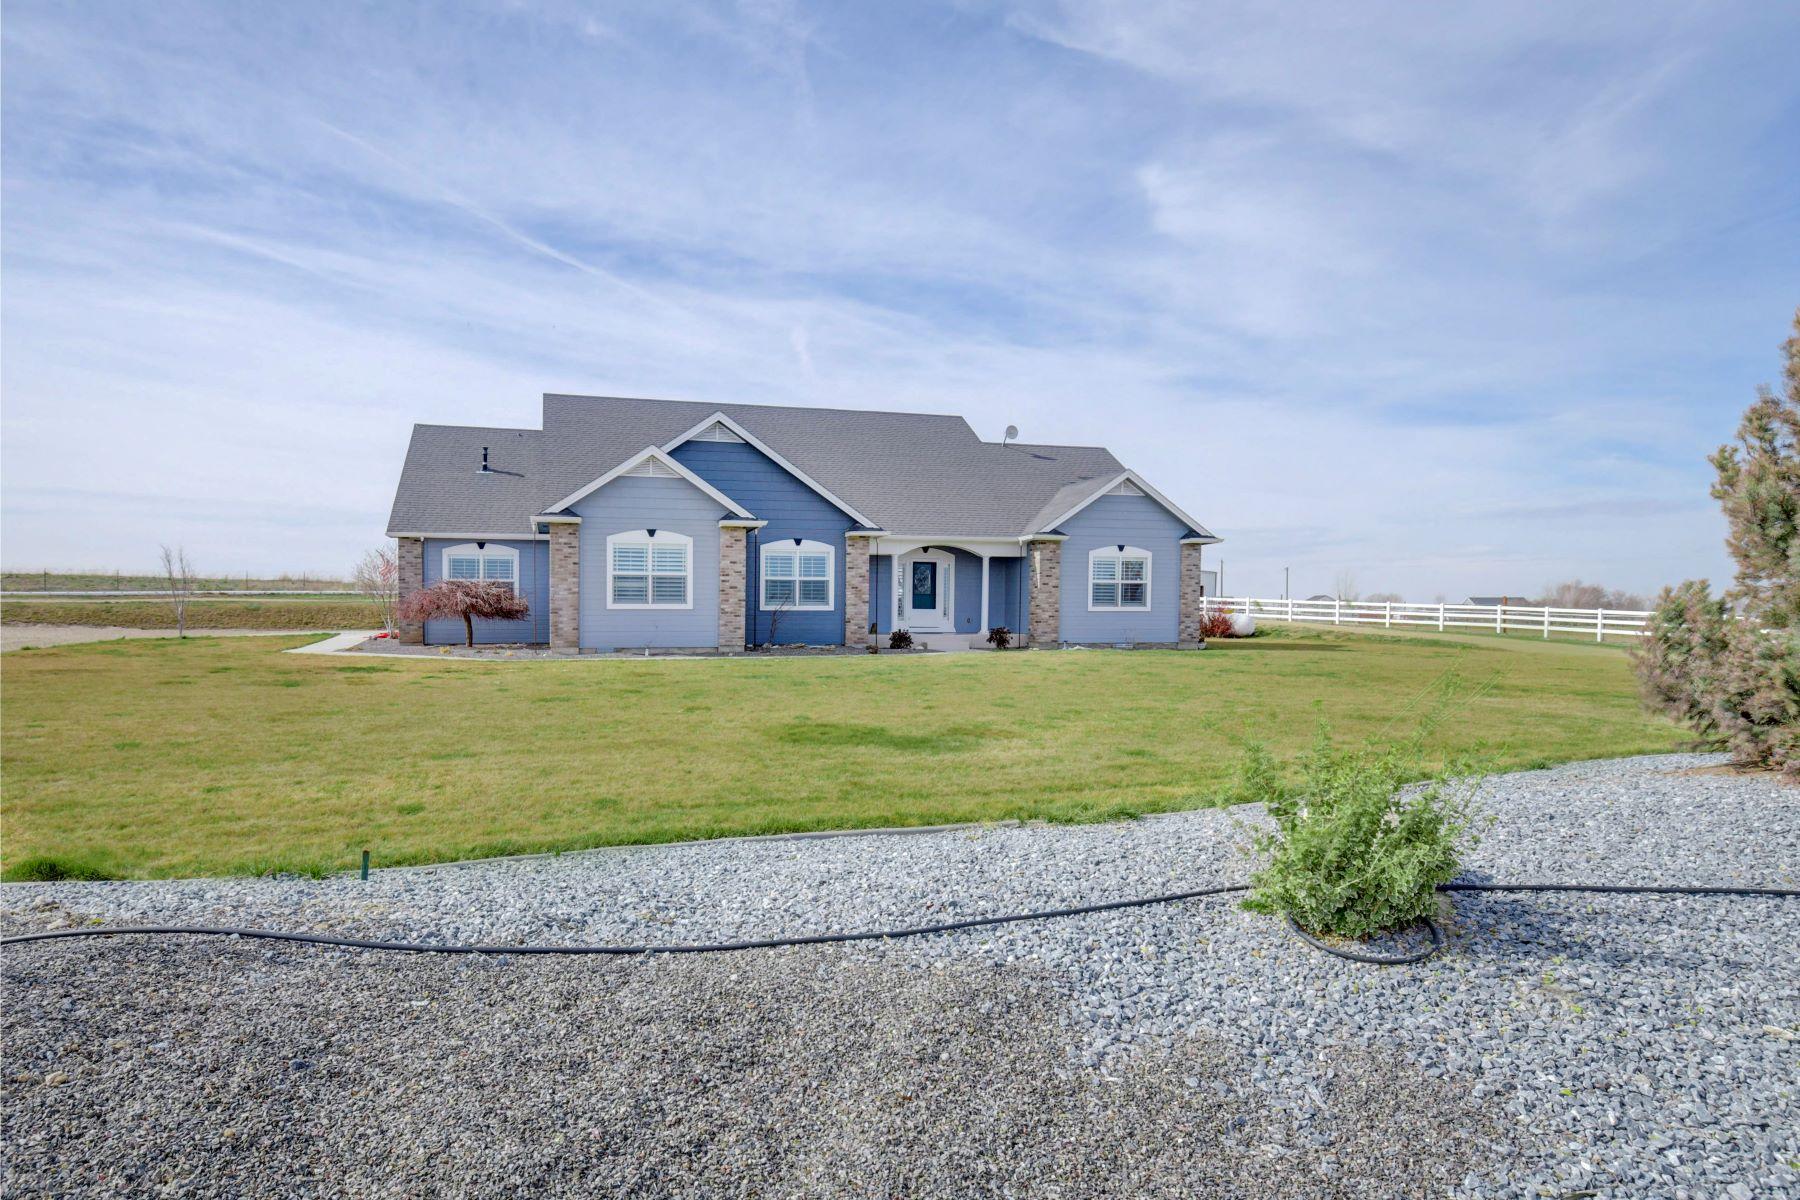 Single Family Home for Active at 9075 Greenhurst, Kuna 9075 S Greenhurst Kuna, Idaho 83634 United States